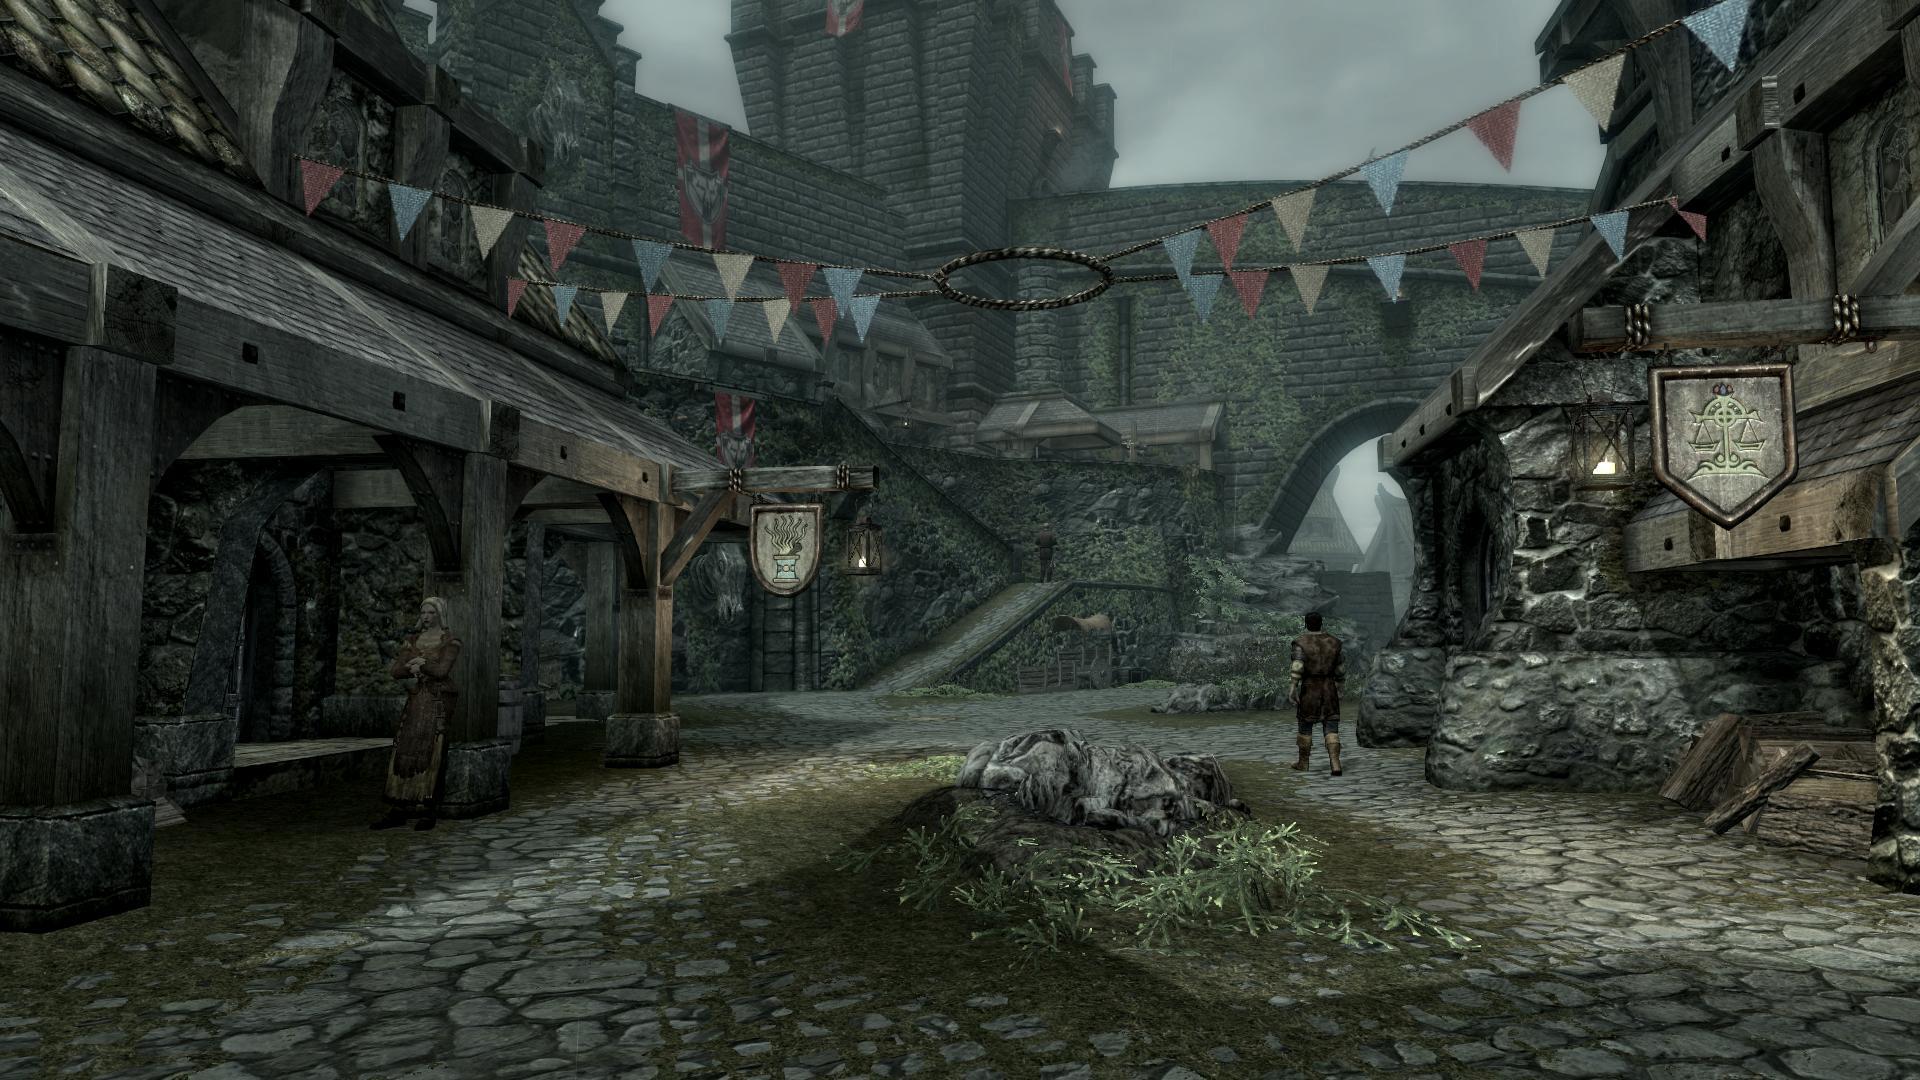 000191.Jpg - Elder Scrolls 5: Skyrim, the